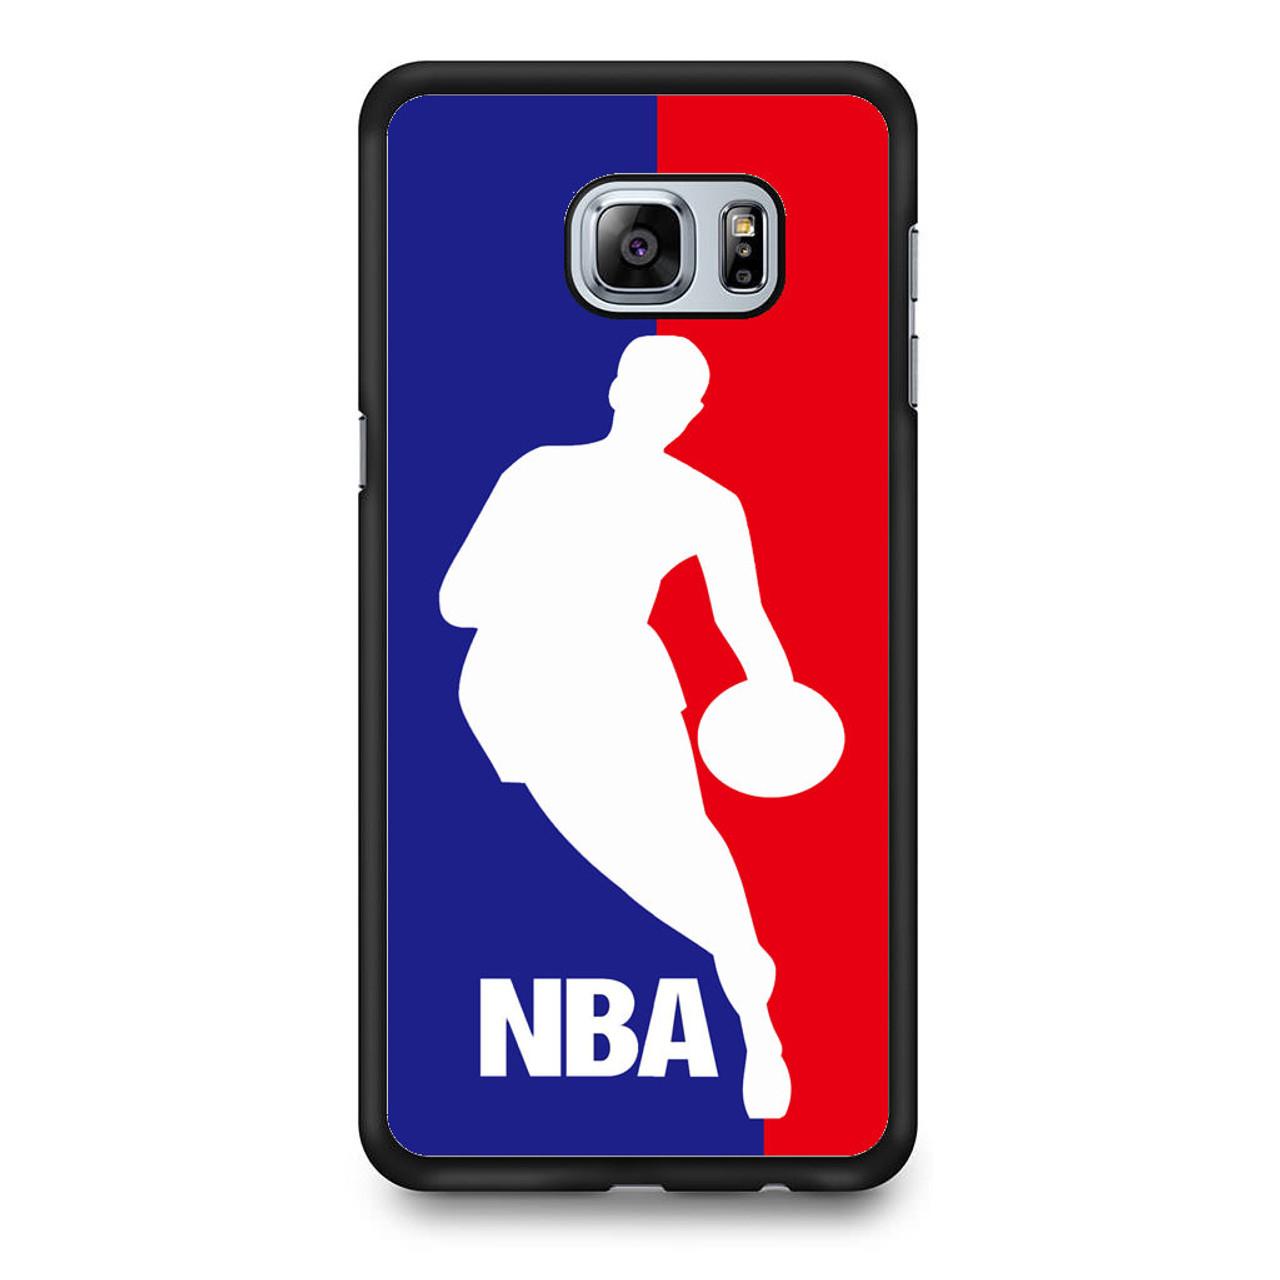 new style 7d294 8ac77 NBA Basketball Samsung Galaxy S6 Edge Plus Case